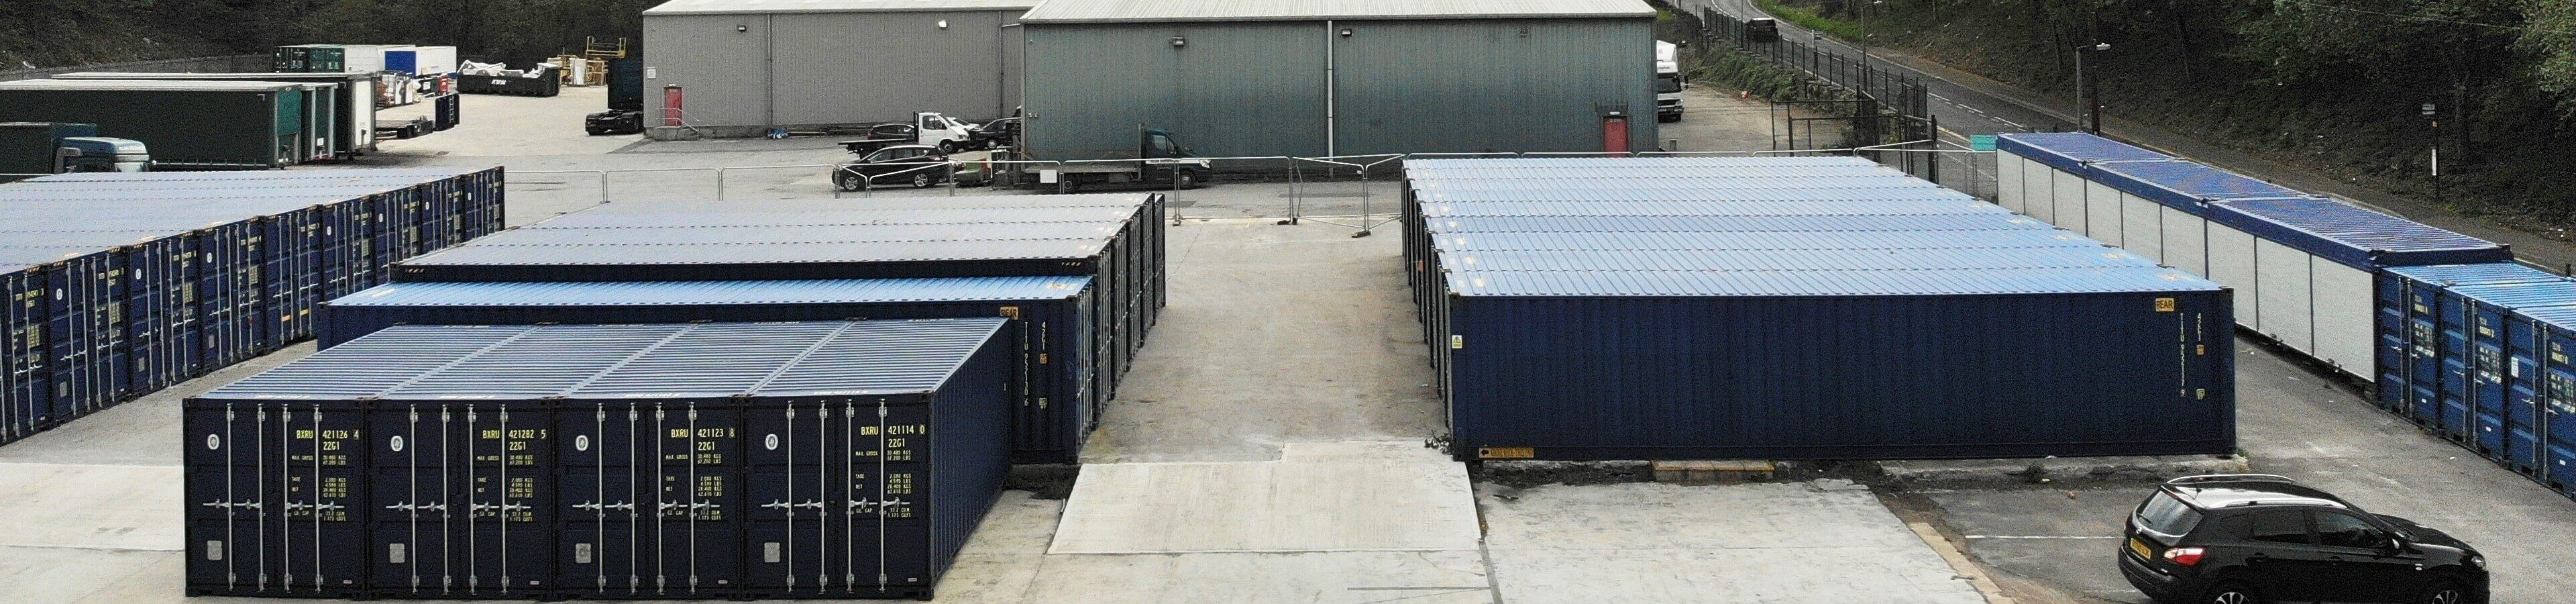 Halifax Self Storage header image | TITAN Containers